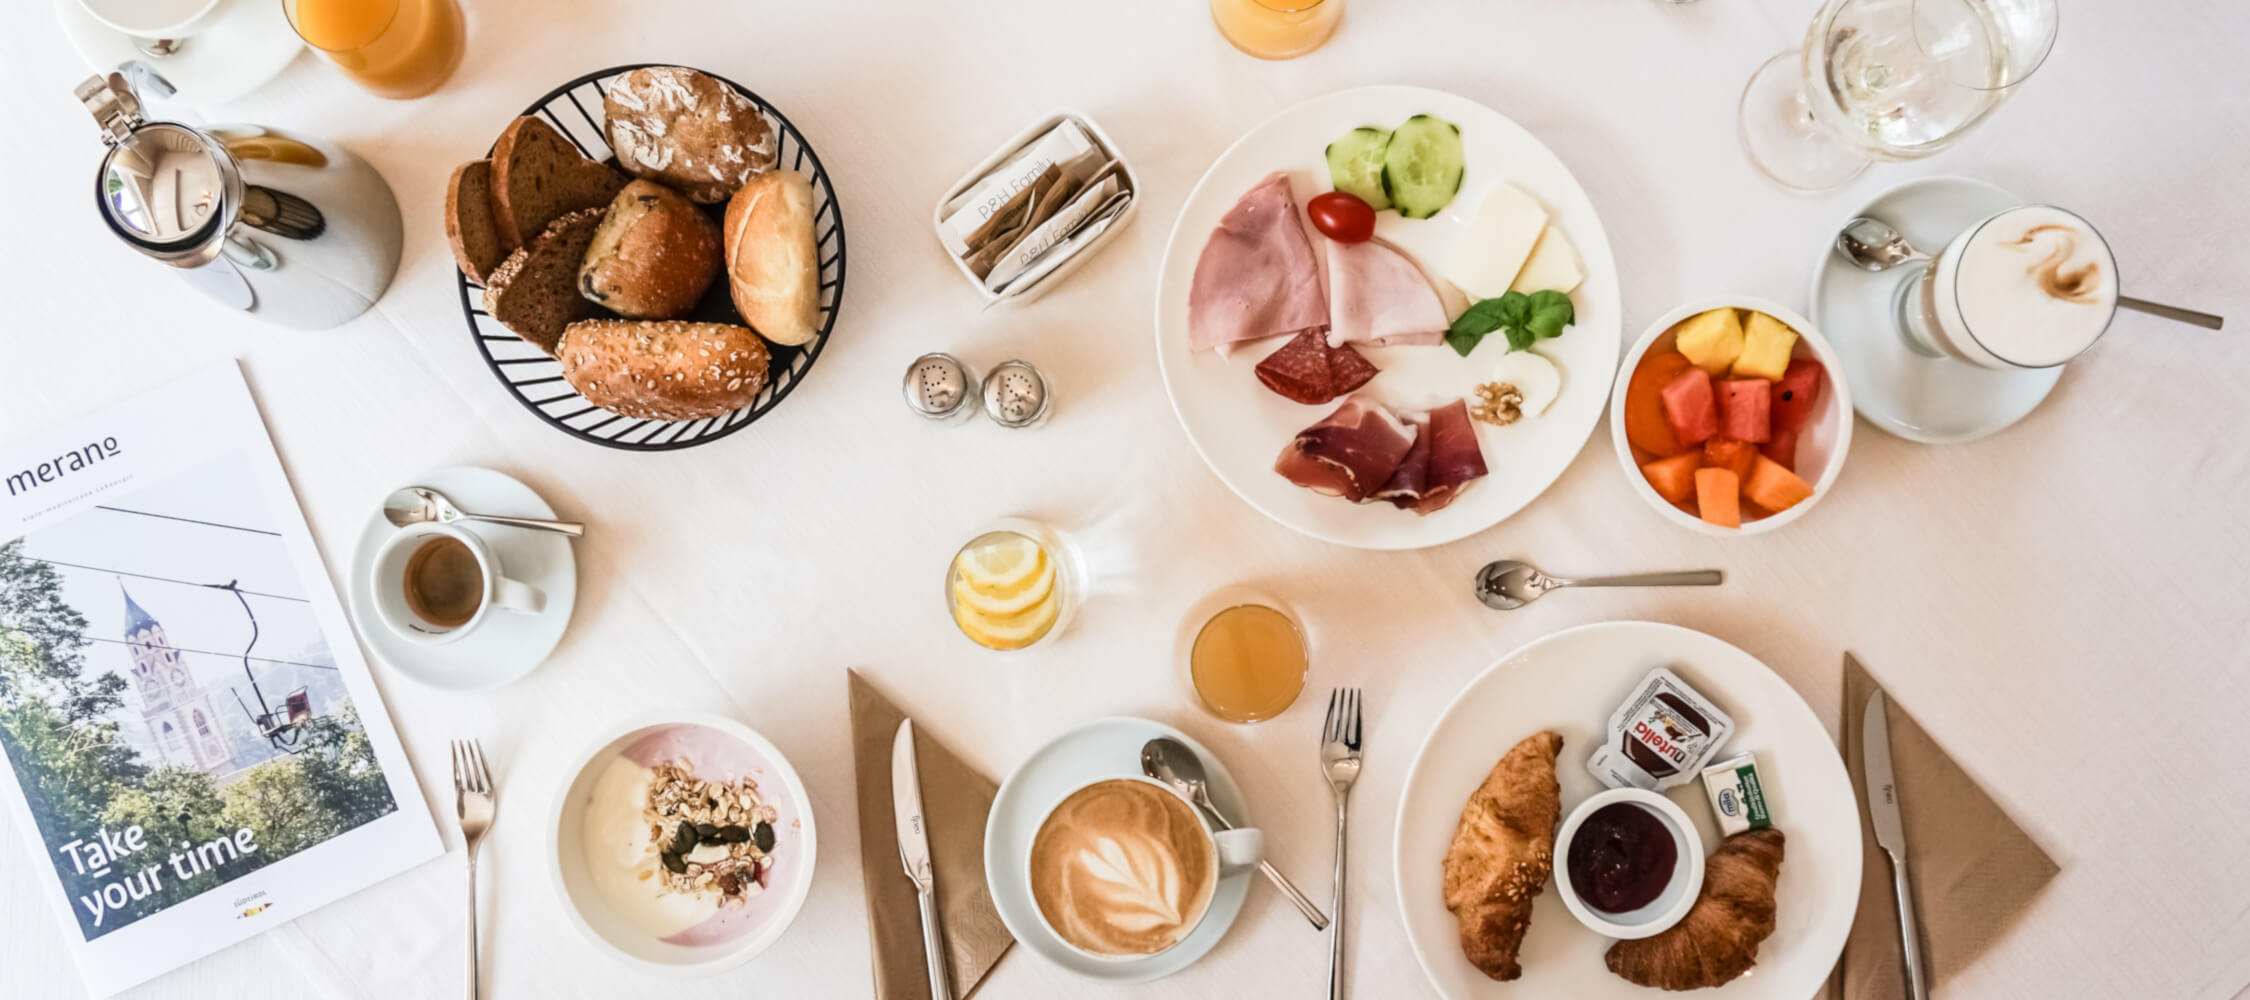 Hotel-Villa-Laurus-Merano-Bar-Lounge-Breakfast-Fruehstueck-Tisch-Anguane-05997-2250x1000